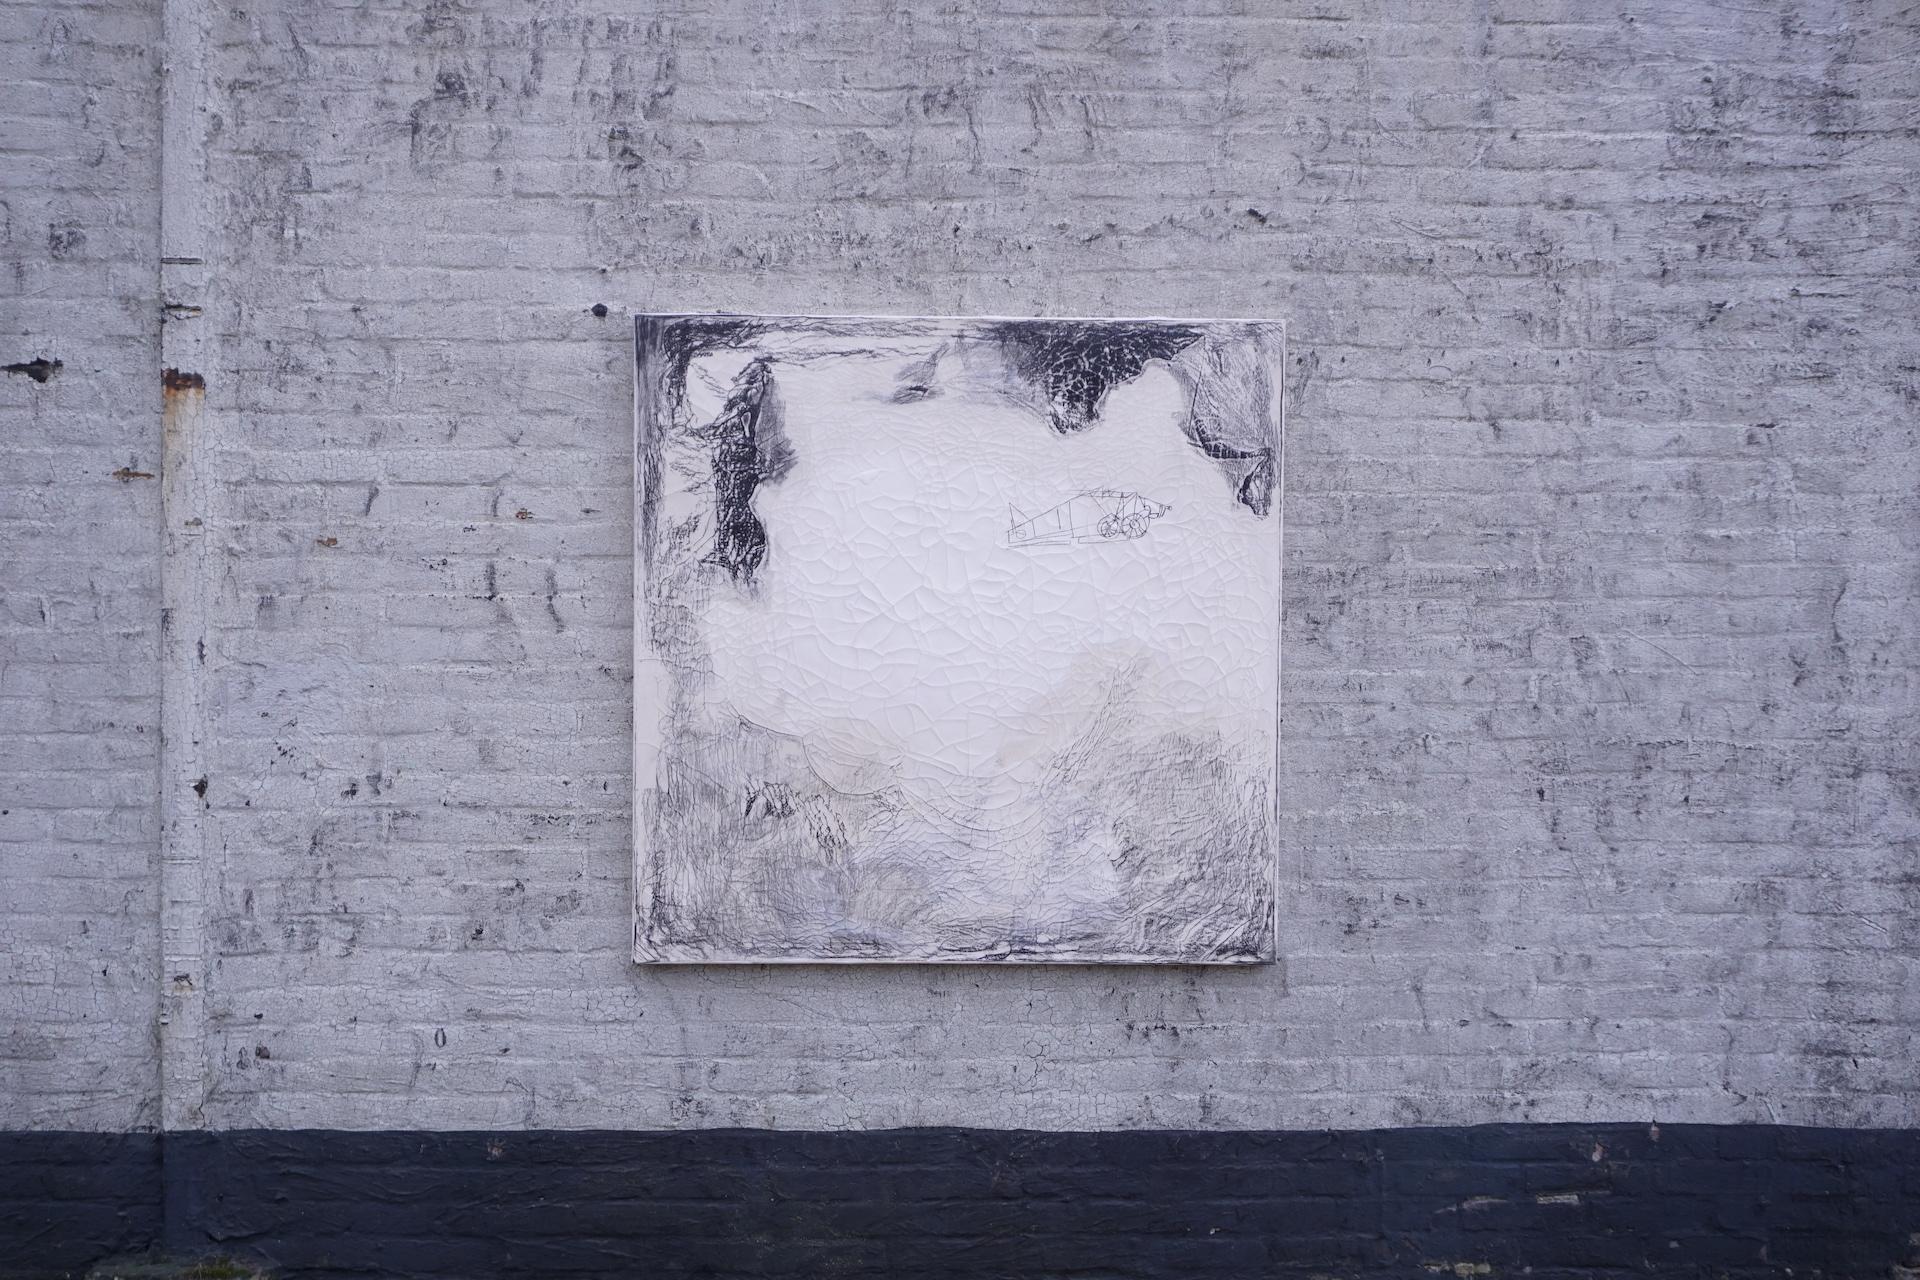 Surrounding Series: Plane, 2019, 120 x 120, rabbitskinglue, crayon powder, charcoal